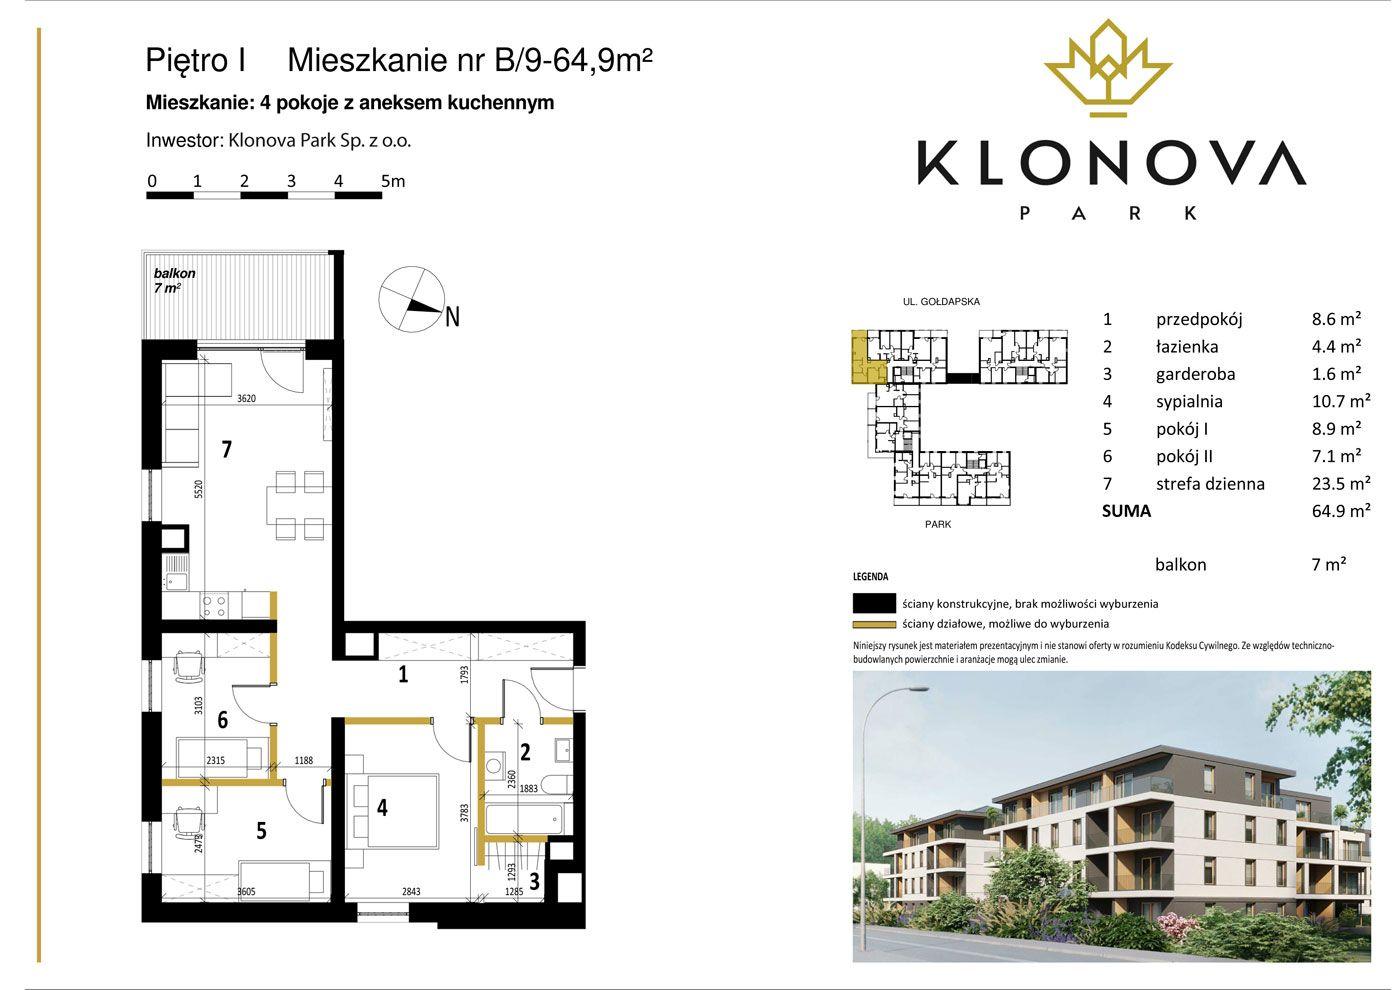 Apartamenty Klonova Park - Plan mieszkania B/9